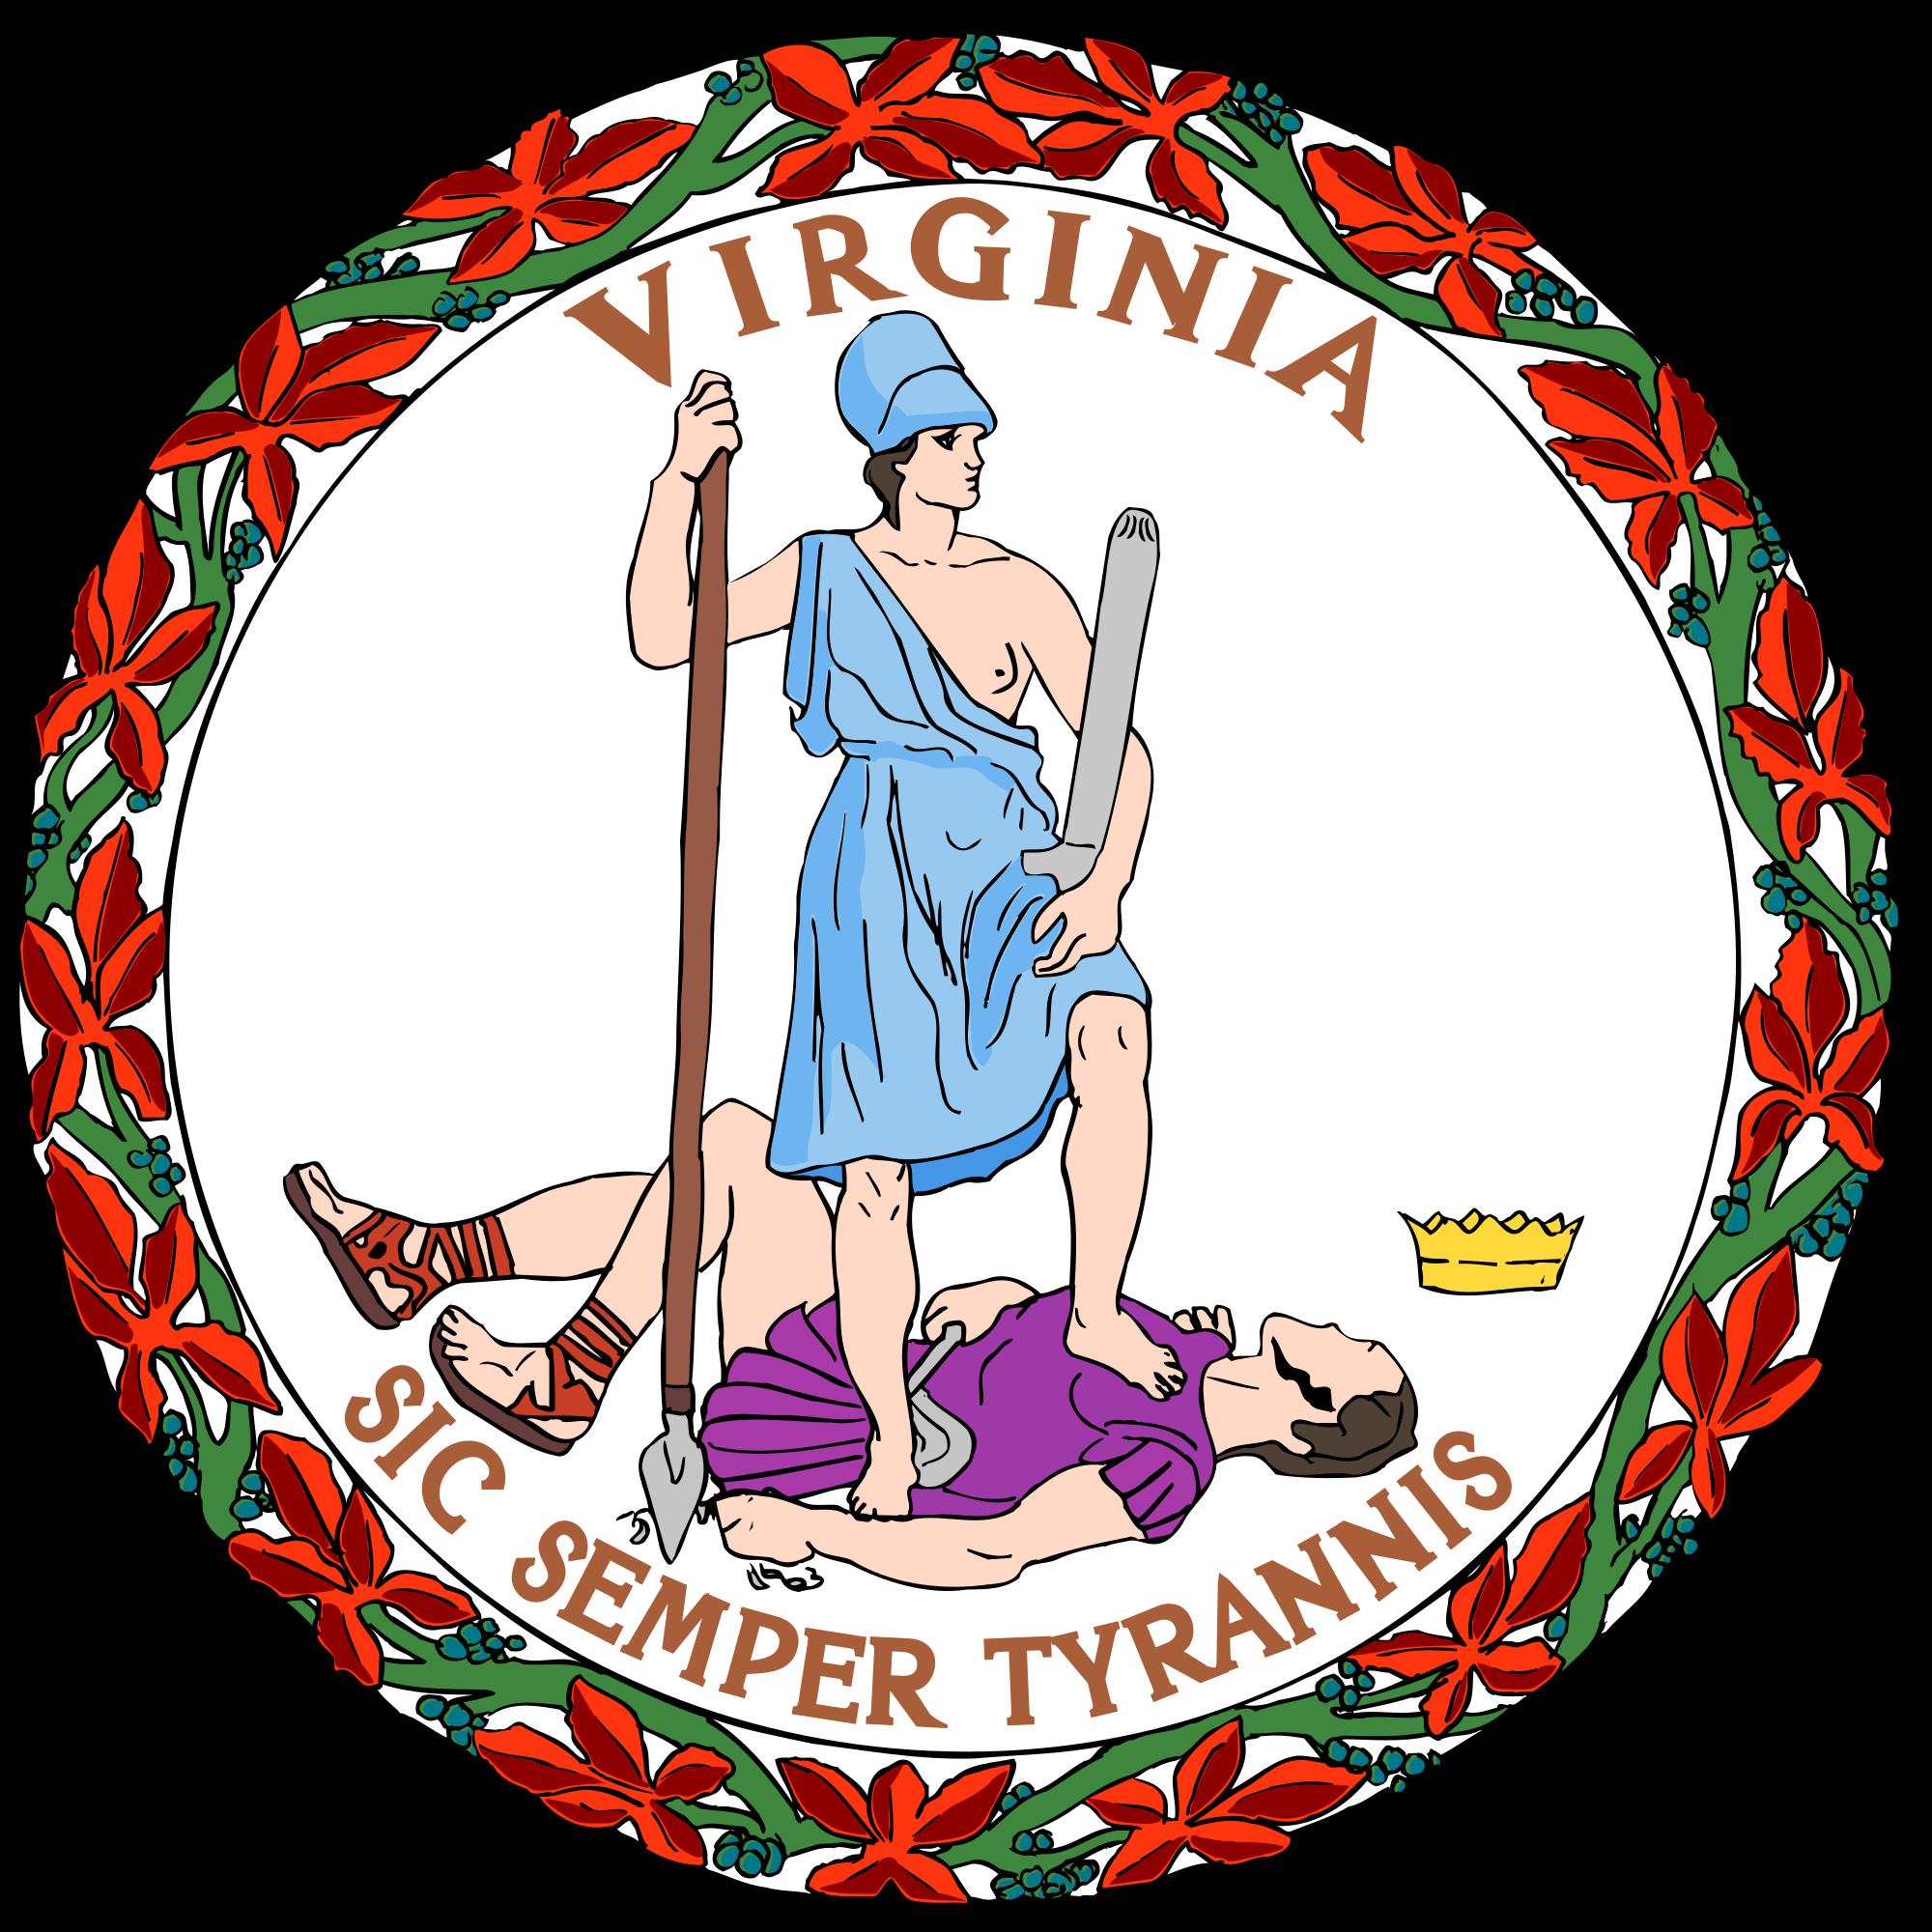 Virginia general assembly clipart clip art transparent Virginia General Assembly - Wikipedia clip art transparent